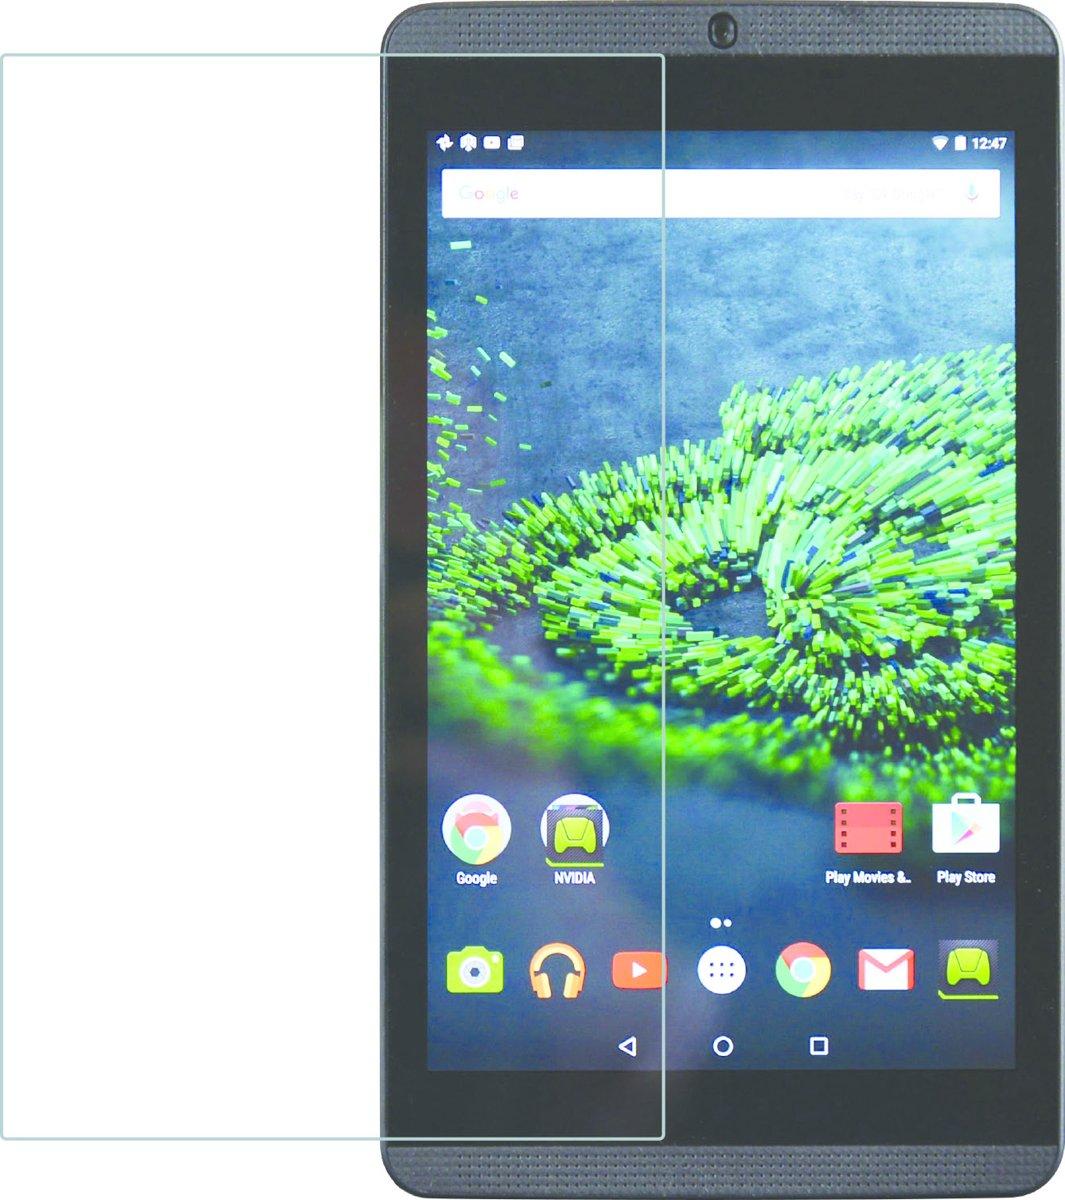 Azuri screenprotector met verhard glas - Voor Nvidia Shield Tablet K1 - Transparant